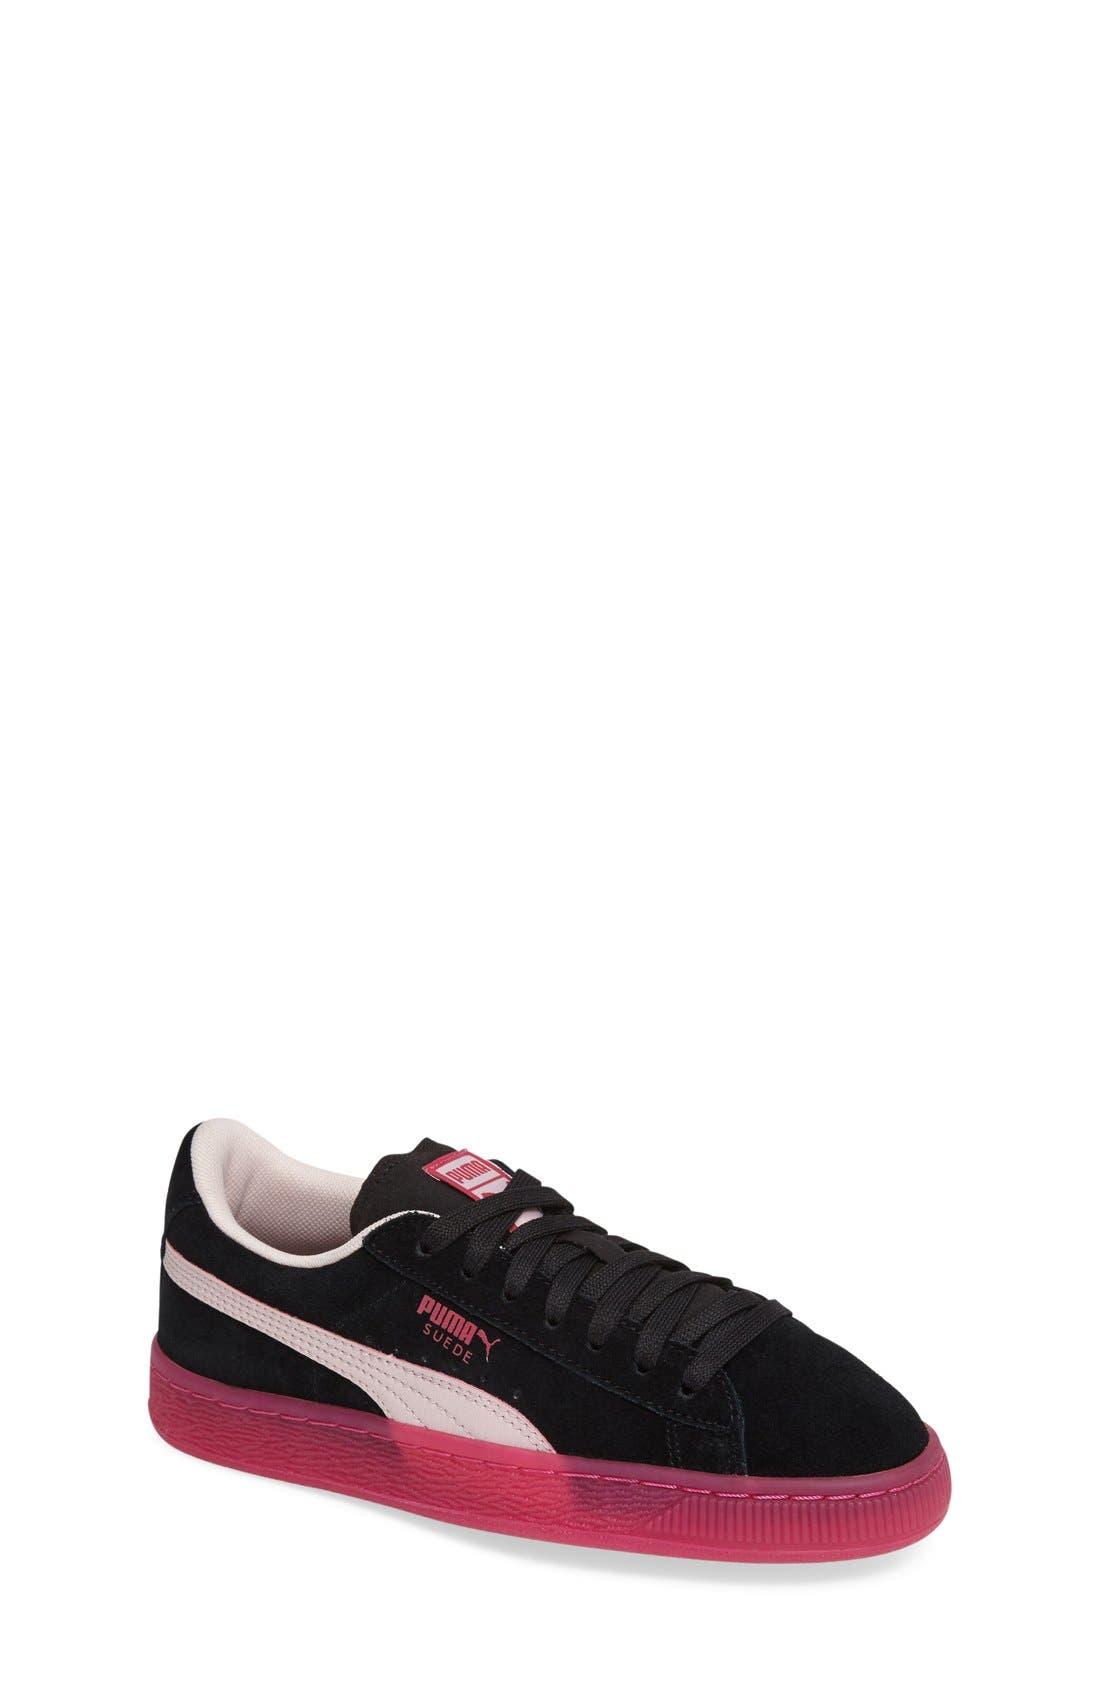 LFS Iced Jr Sneaker,                         Main,                         color, 001